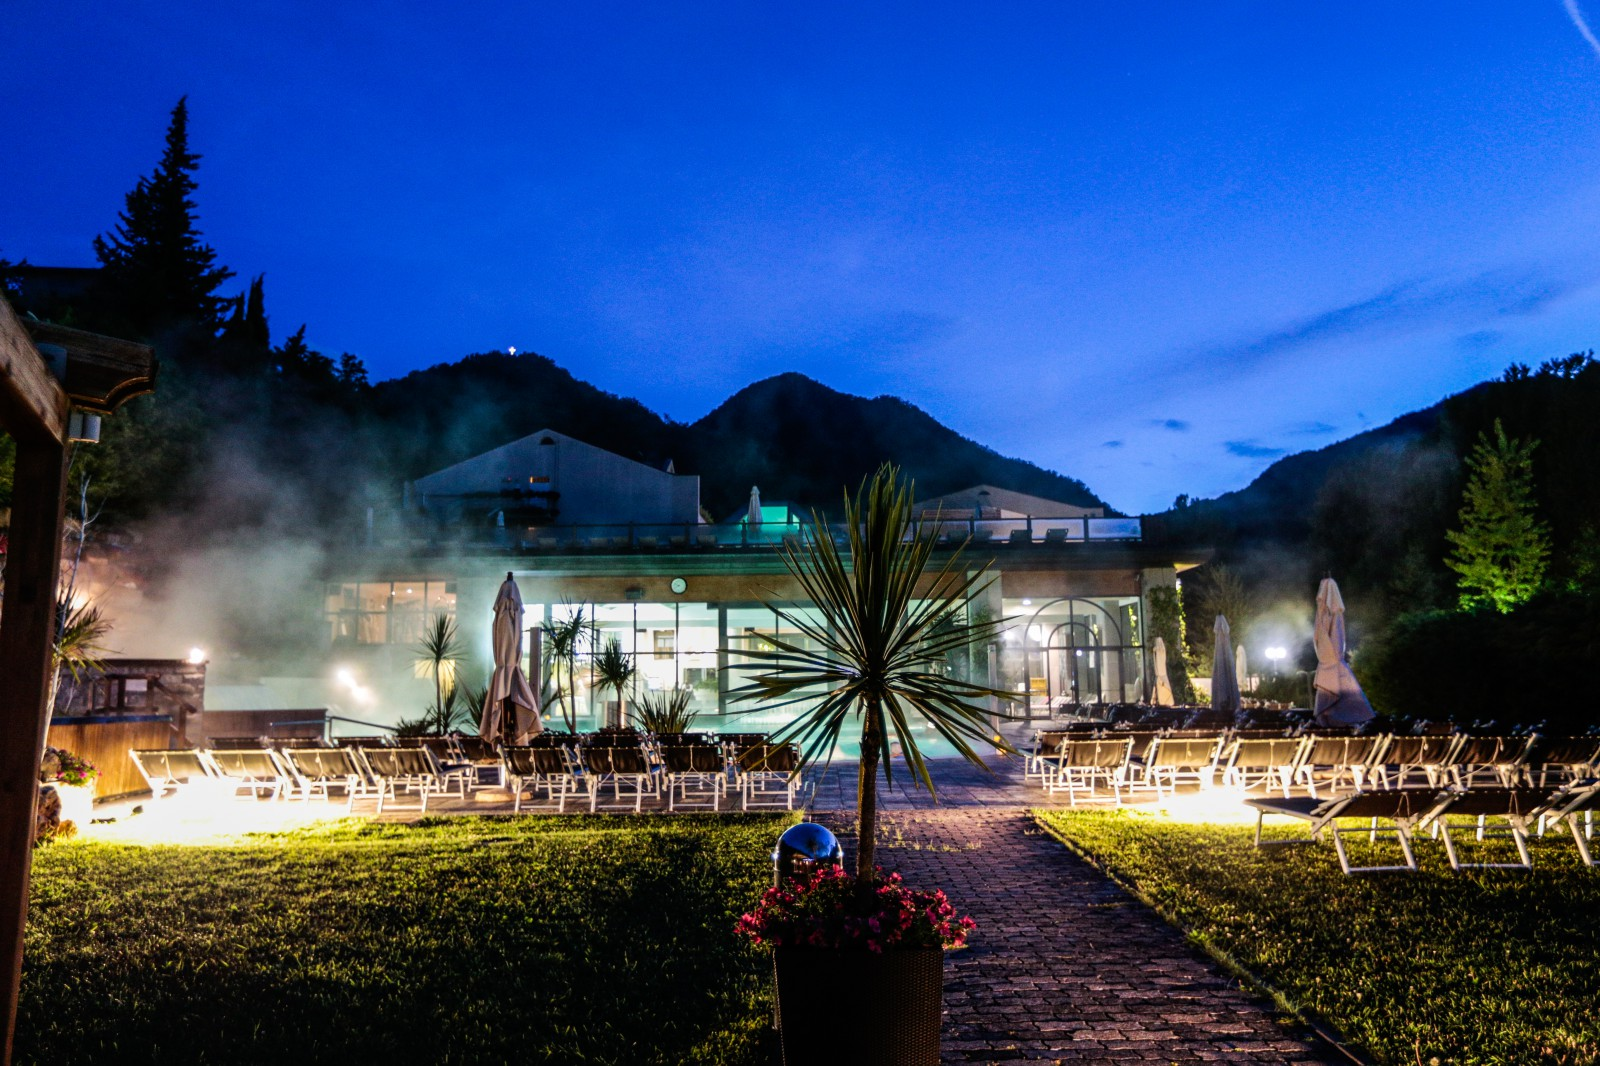 Roseo euroterme wellness resort un 39 oasi di pace a bagno di - Bagno di romagna terme euroterme ...